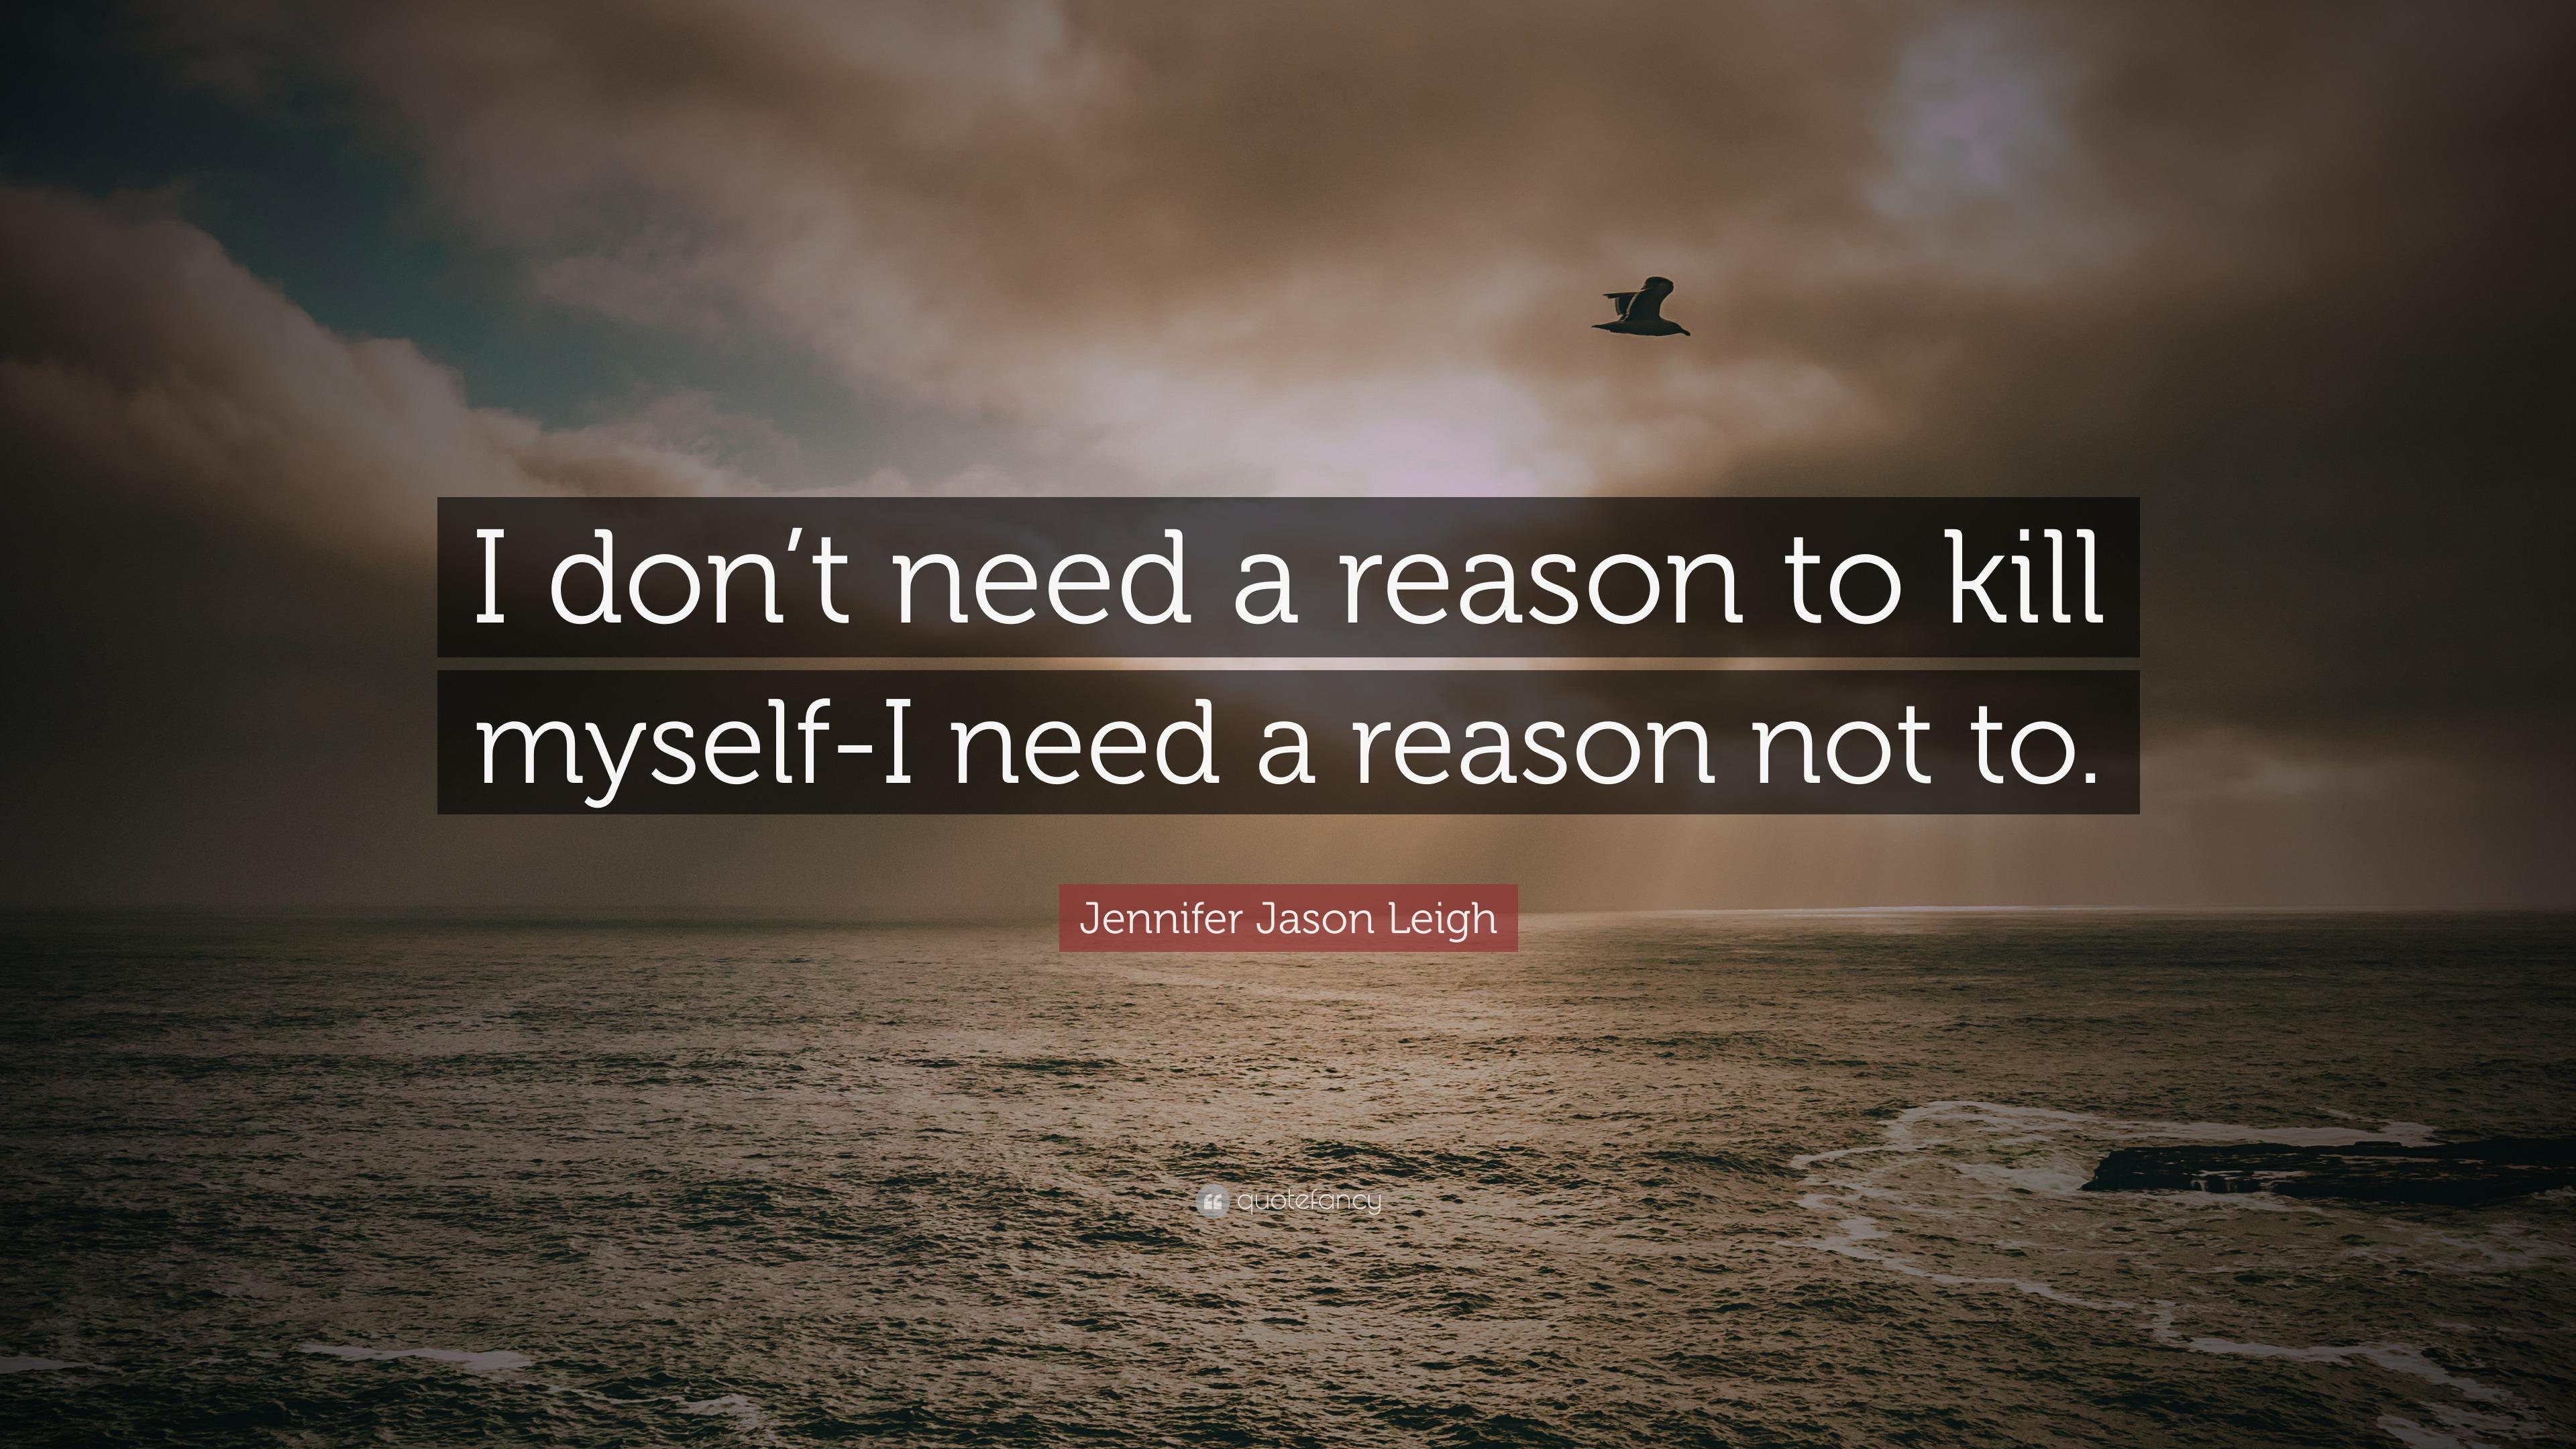 i want to kill myself for no reason